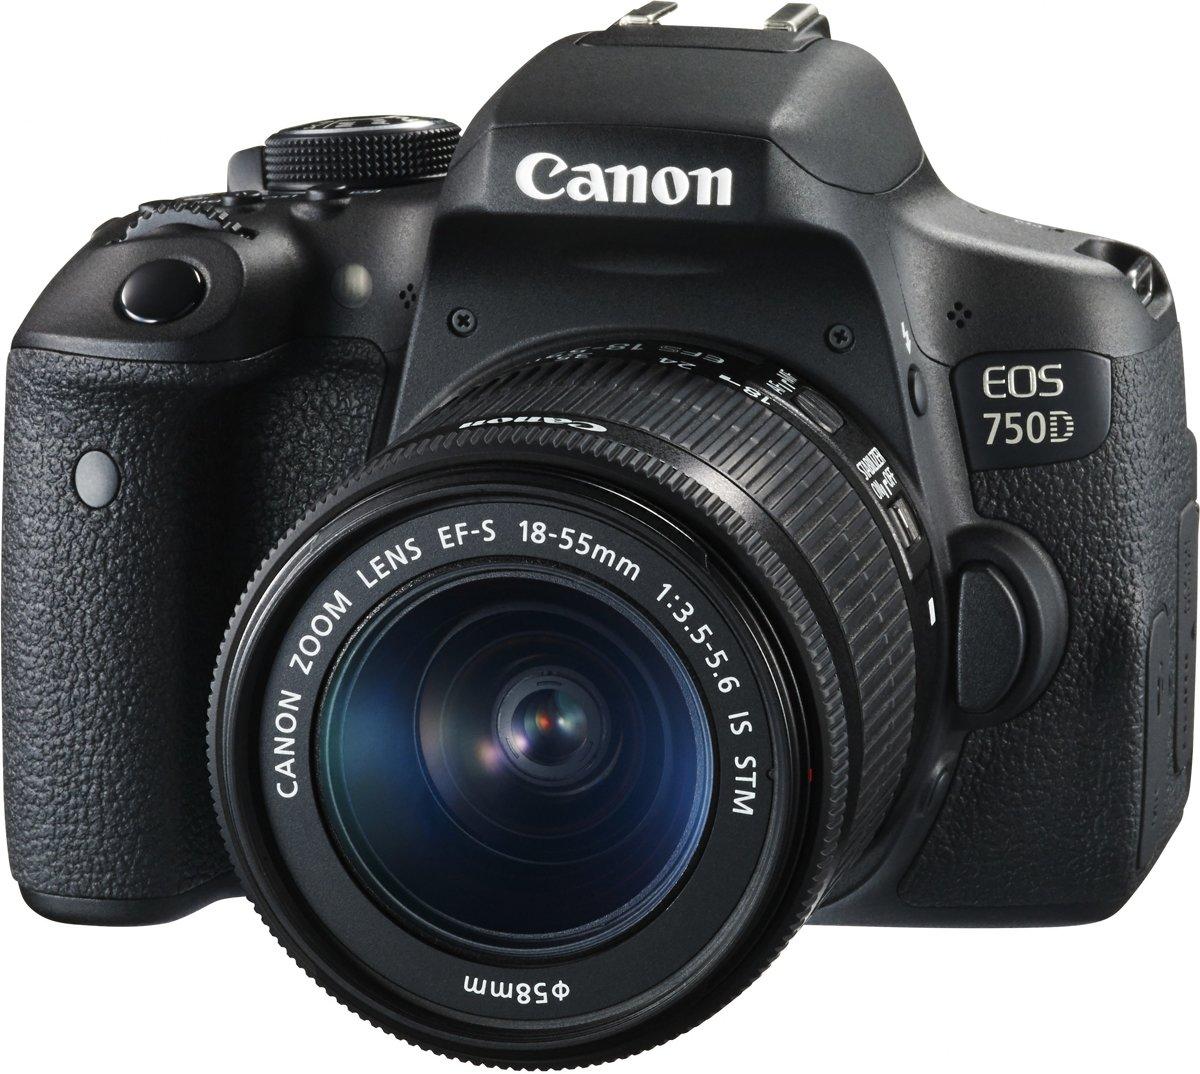 CANON EOS 750D + EF-S 18-55mm IS STM kopen